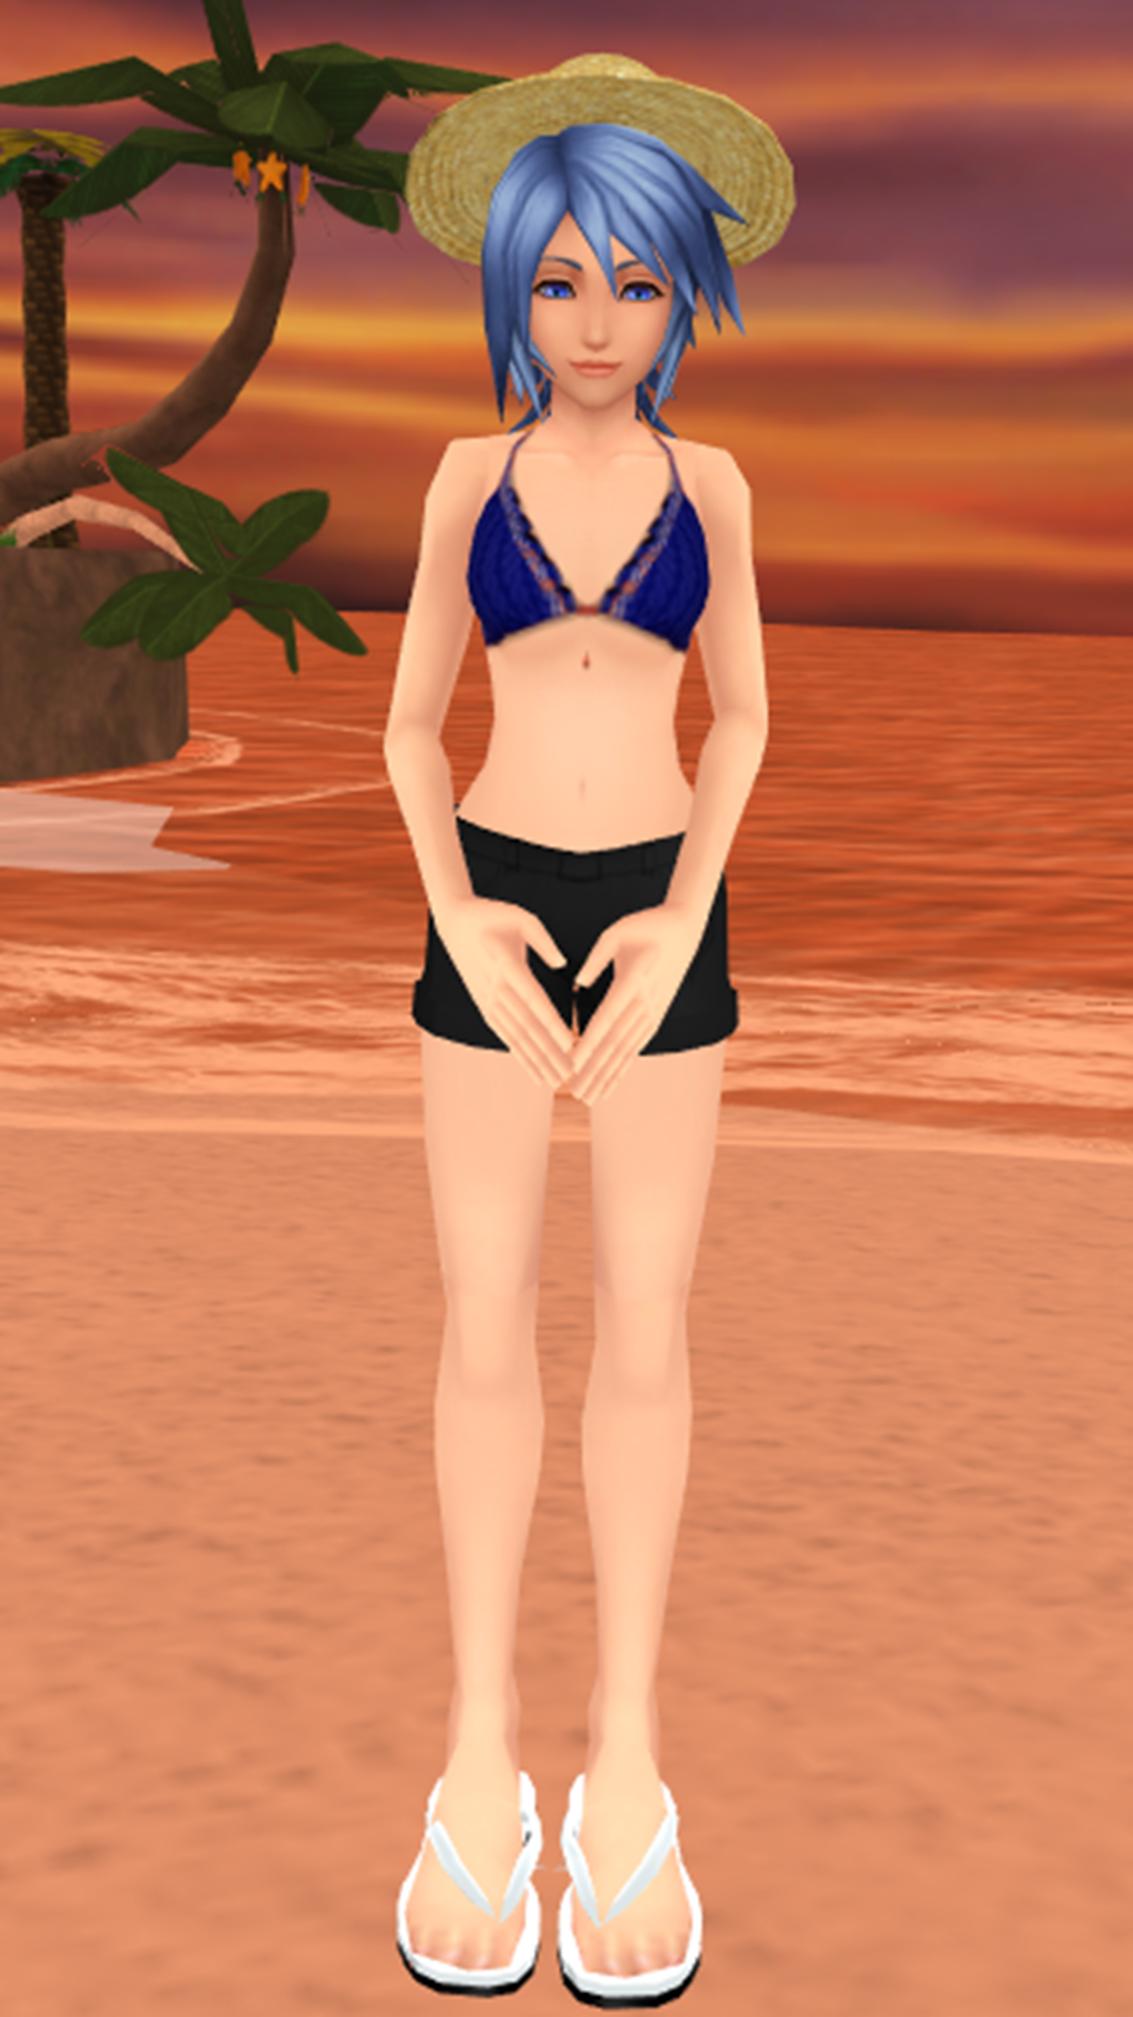 aqua girl naked